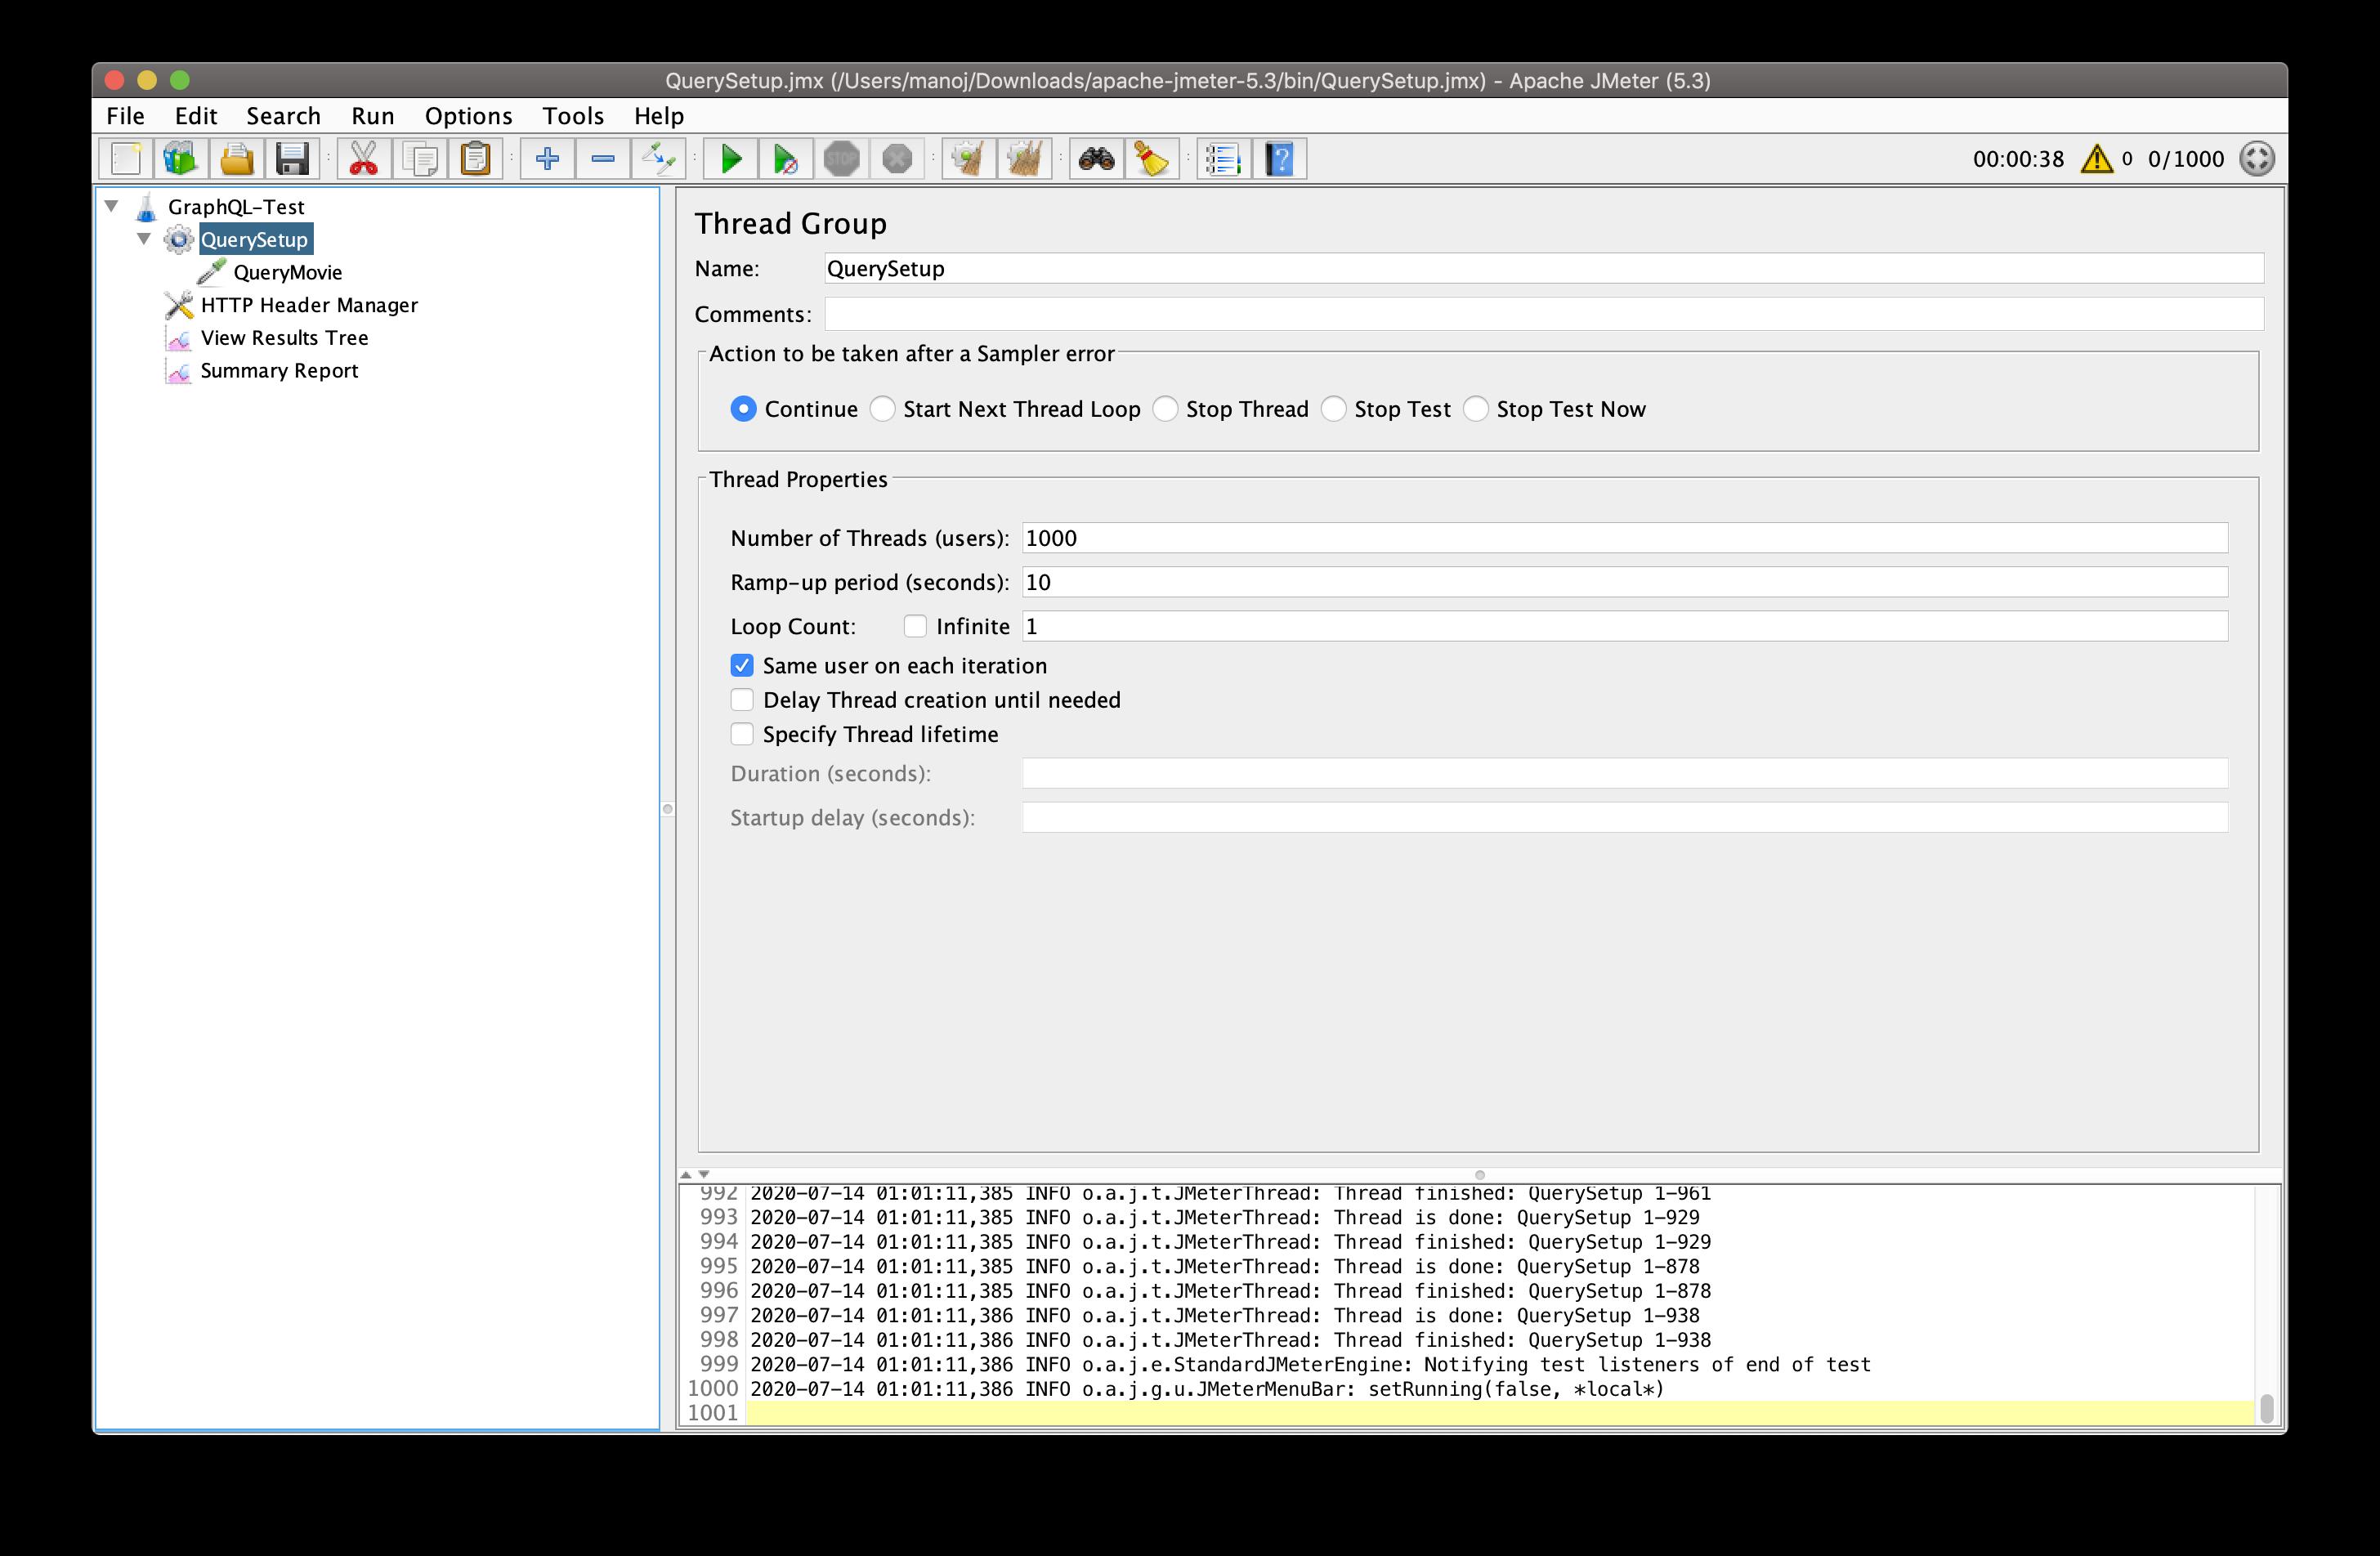 Performance Testing of GraphQL API